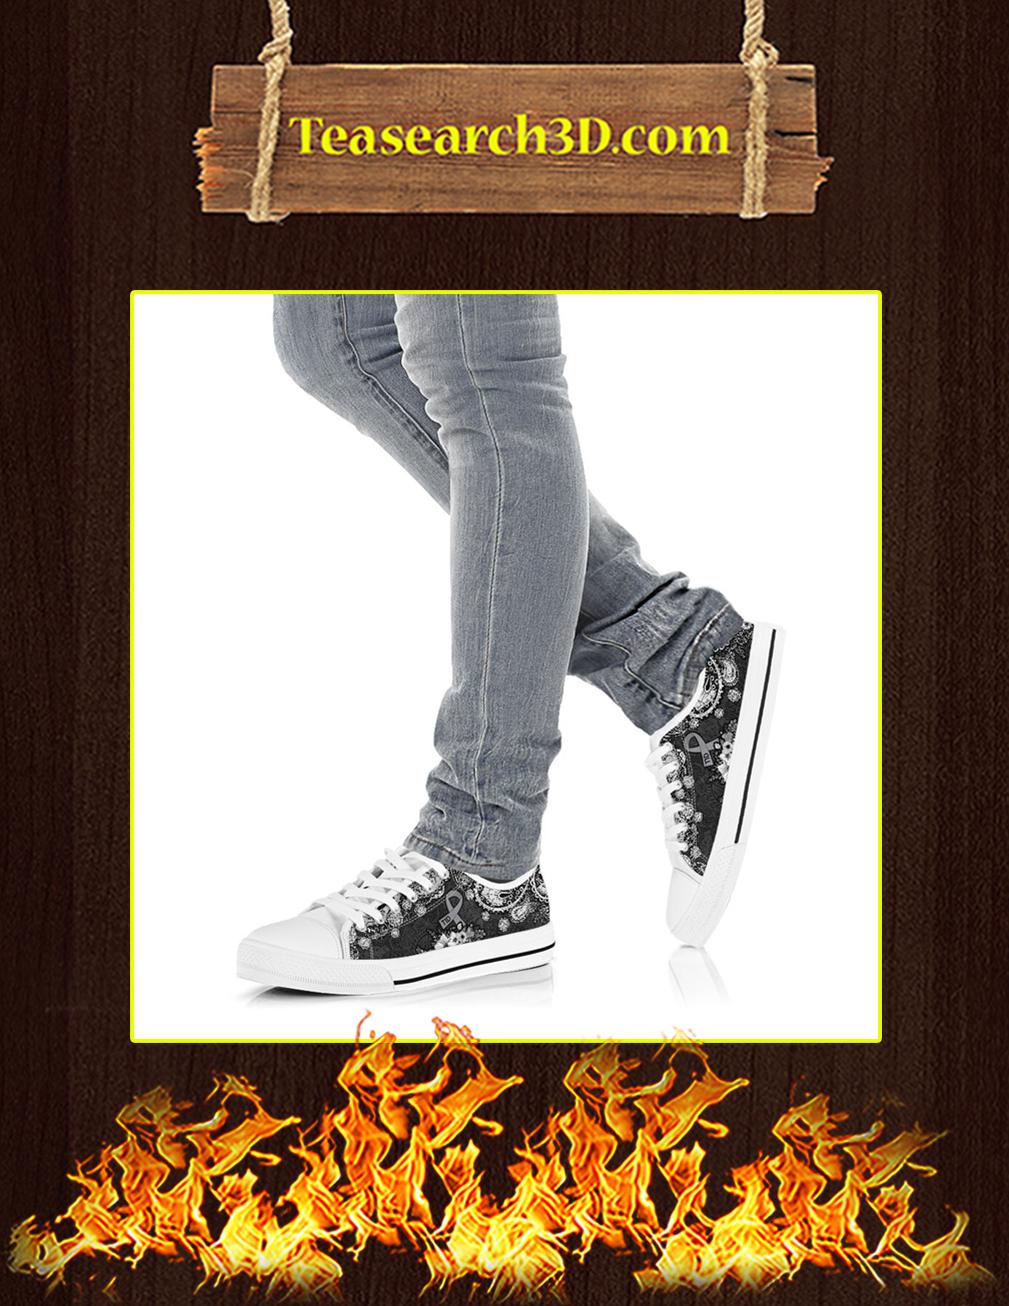 T1D Low Top Shoes Pic 3